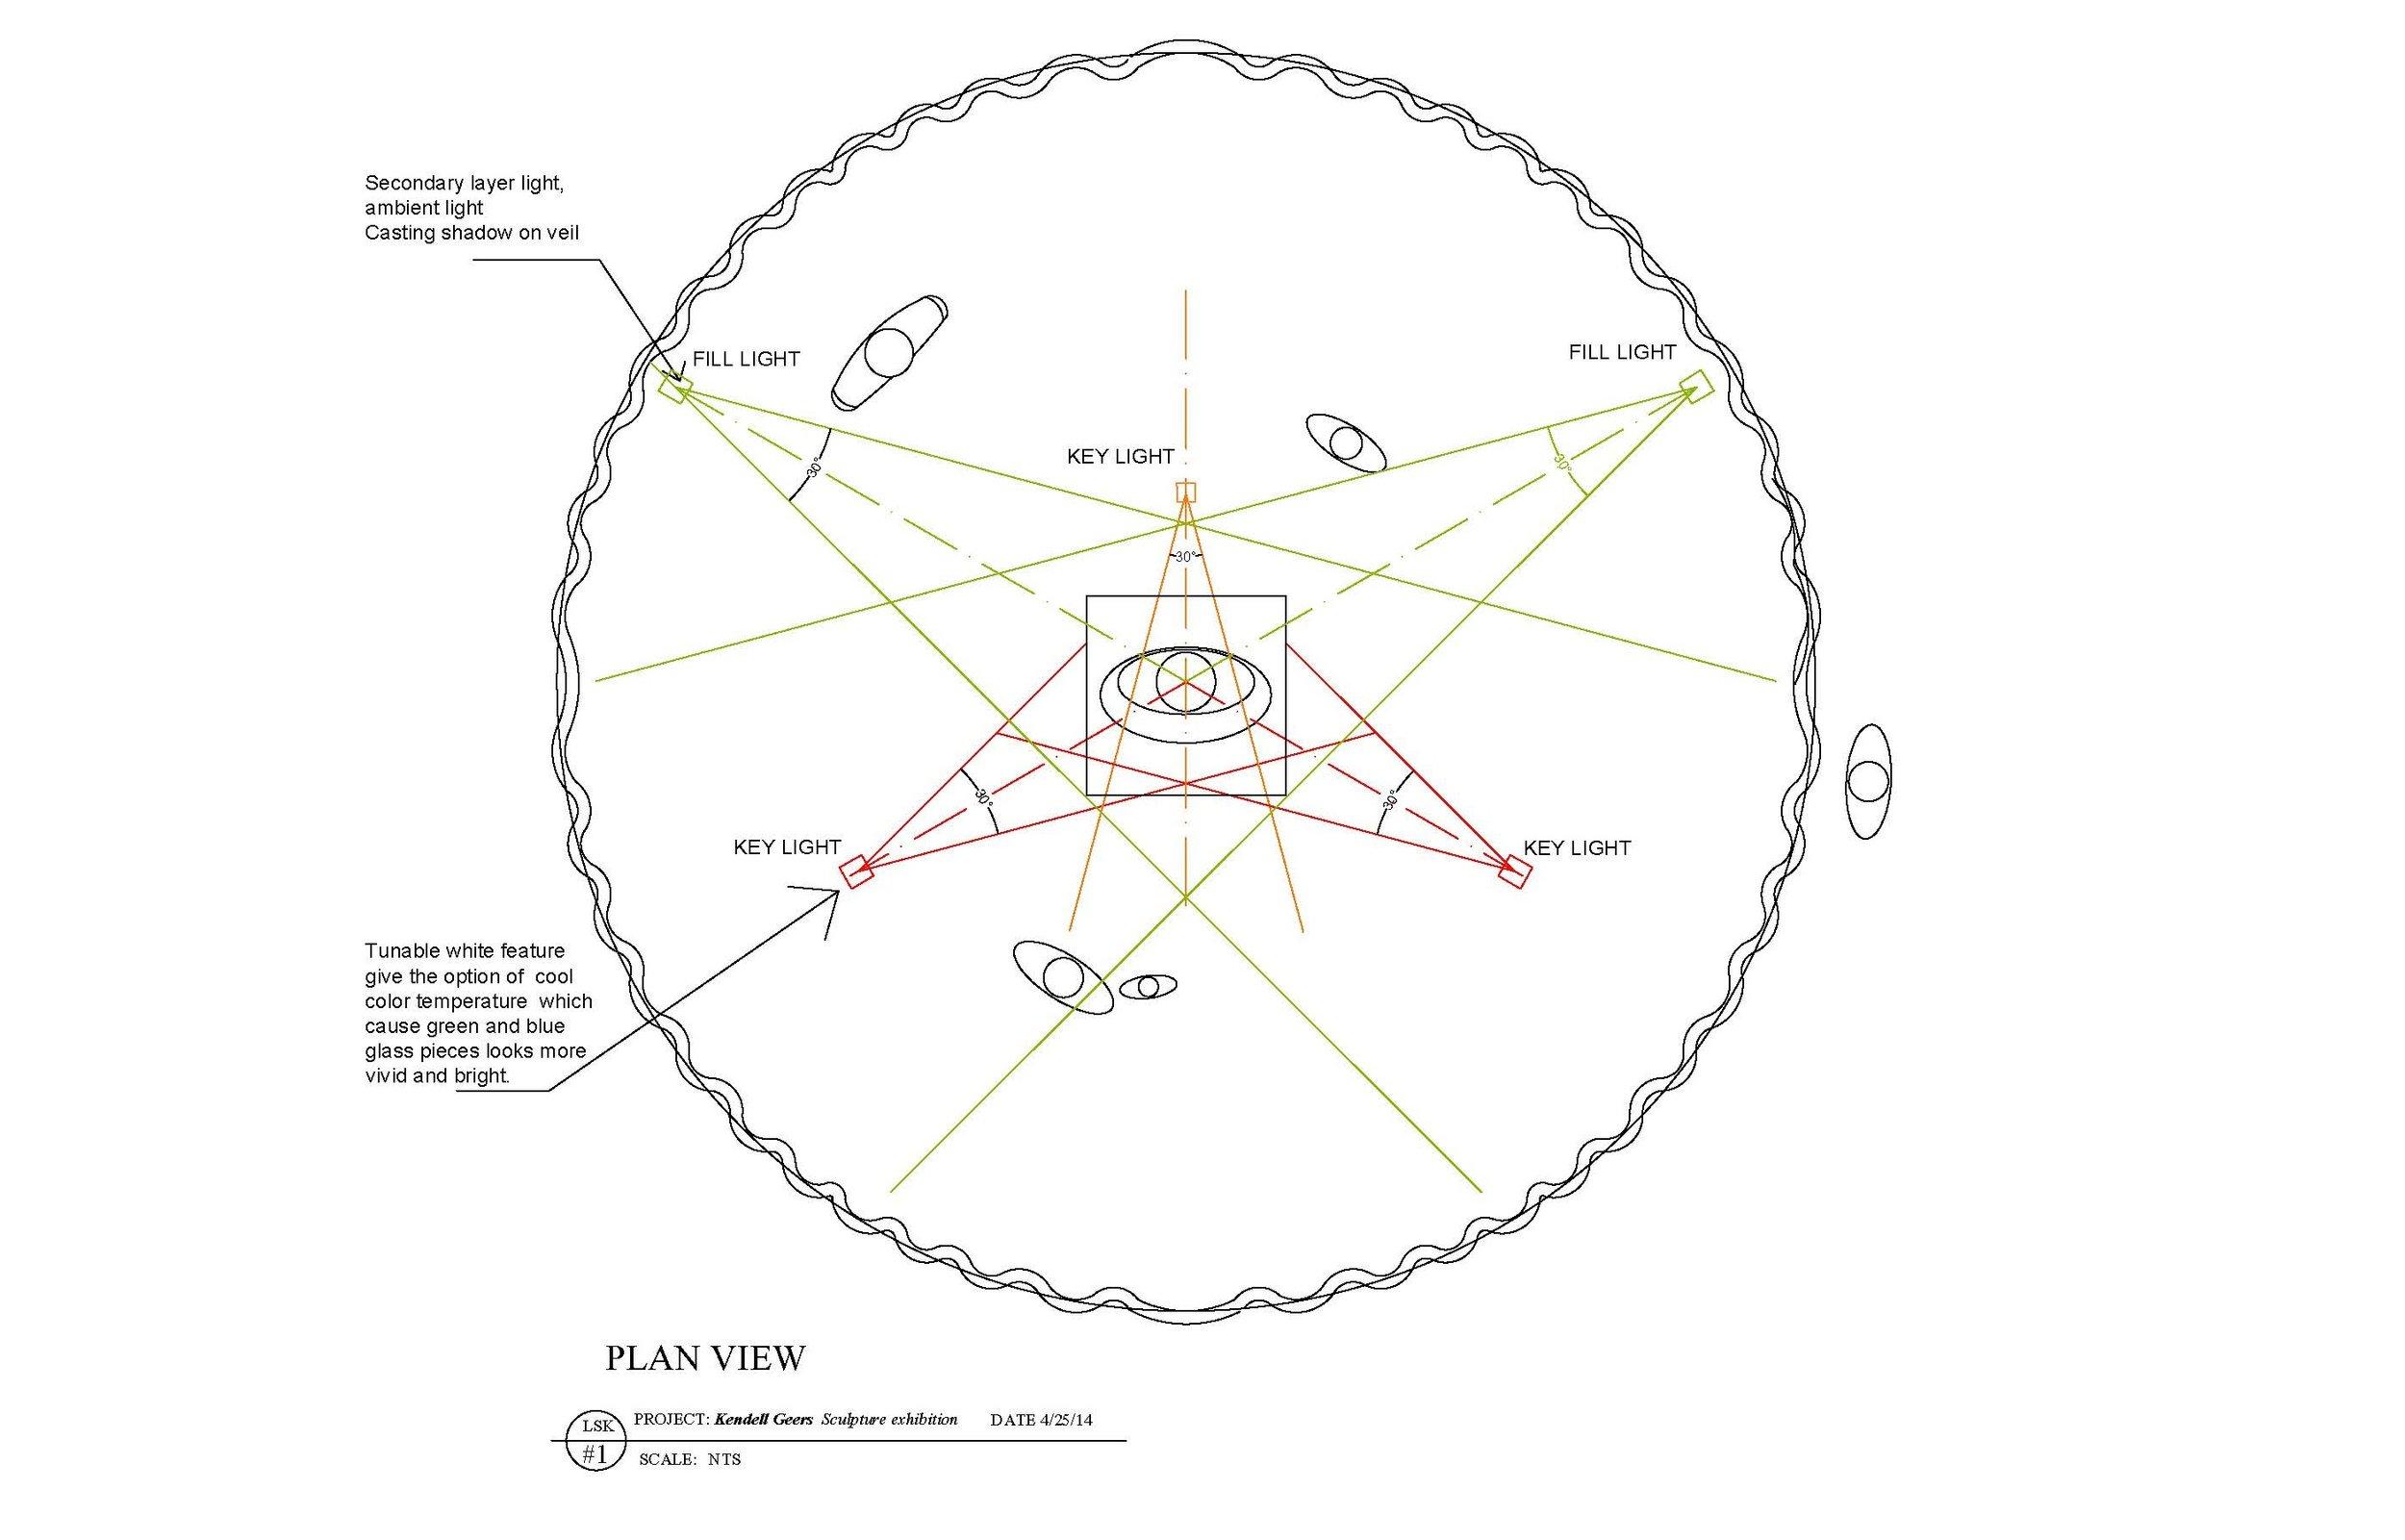 fatemeh-abadian-mps-interior-lighting-design-projects_17617782276_o.jpg